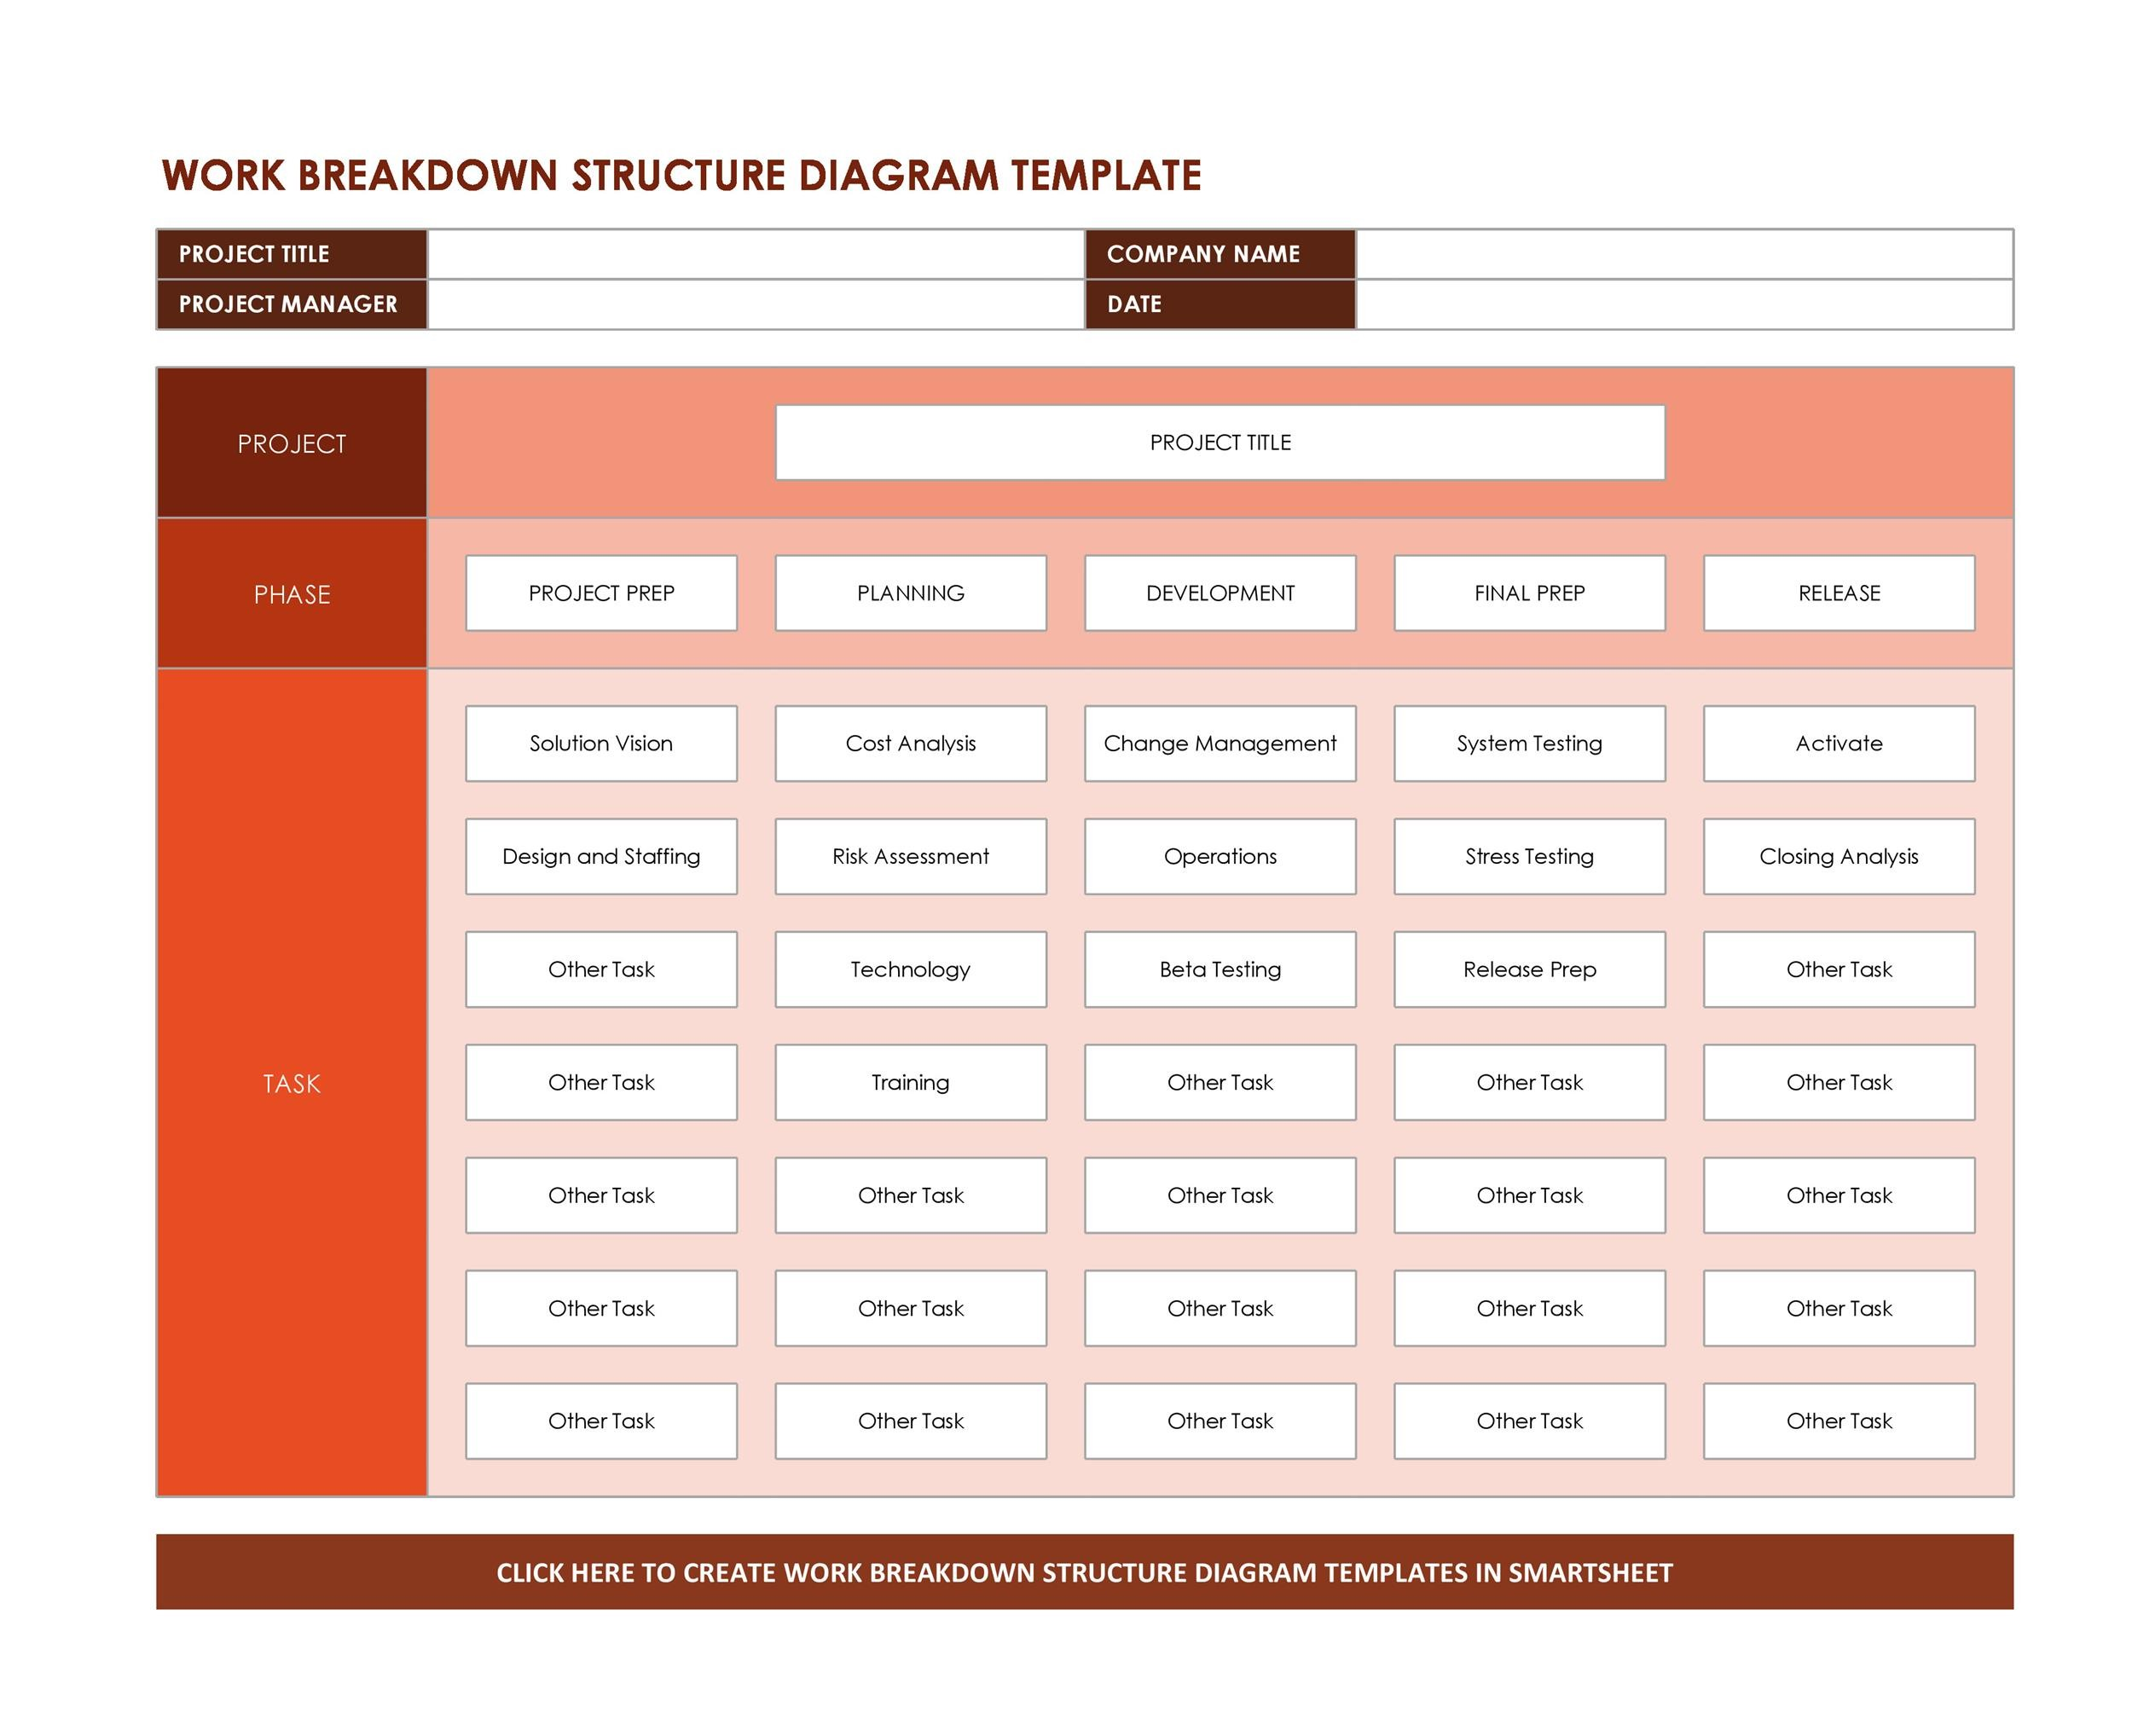 work breakdown structure template 15 template lab. Black Bedroom Furniture Sets. Home Design Ideas